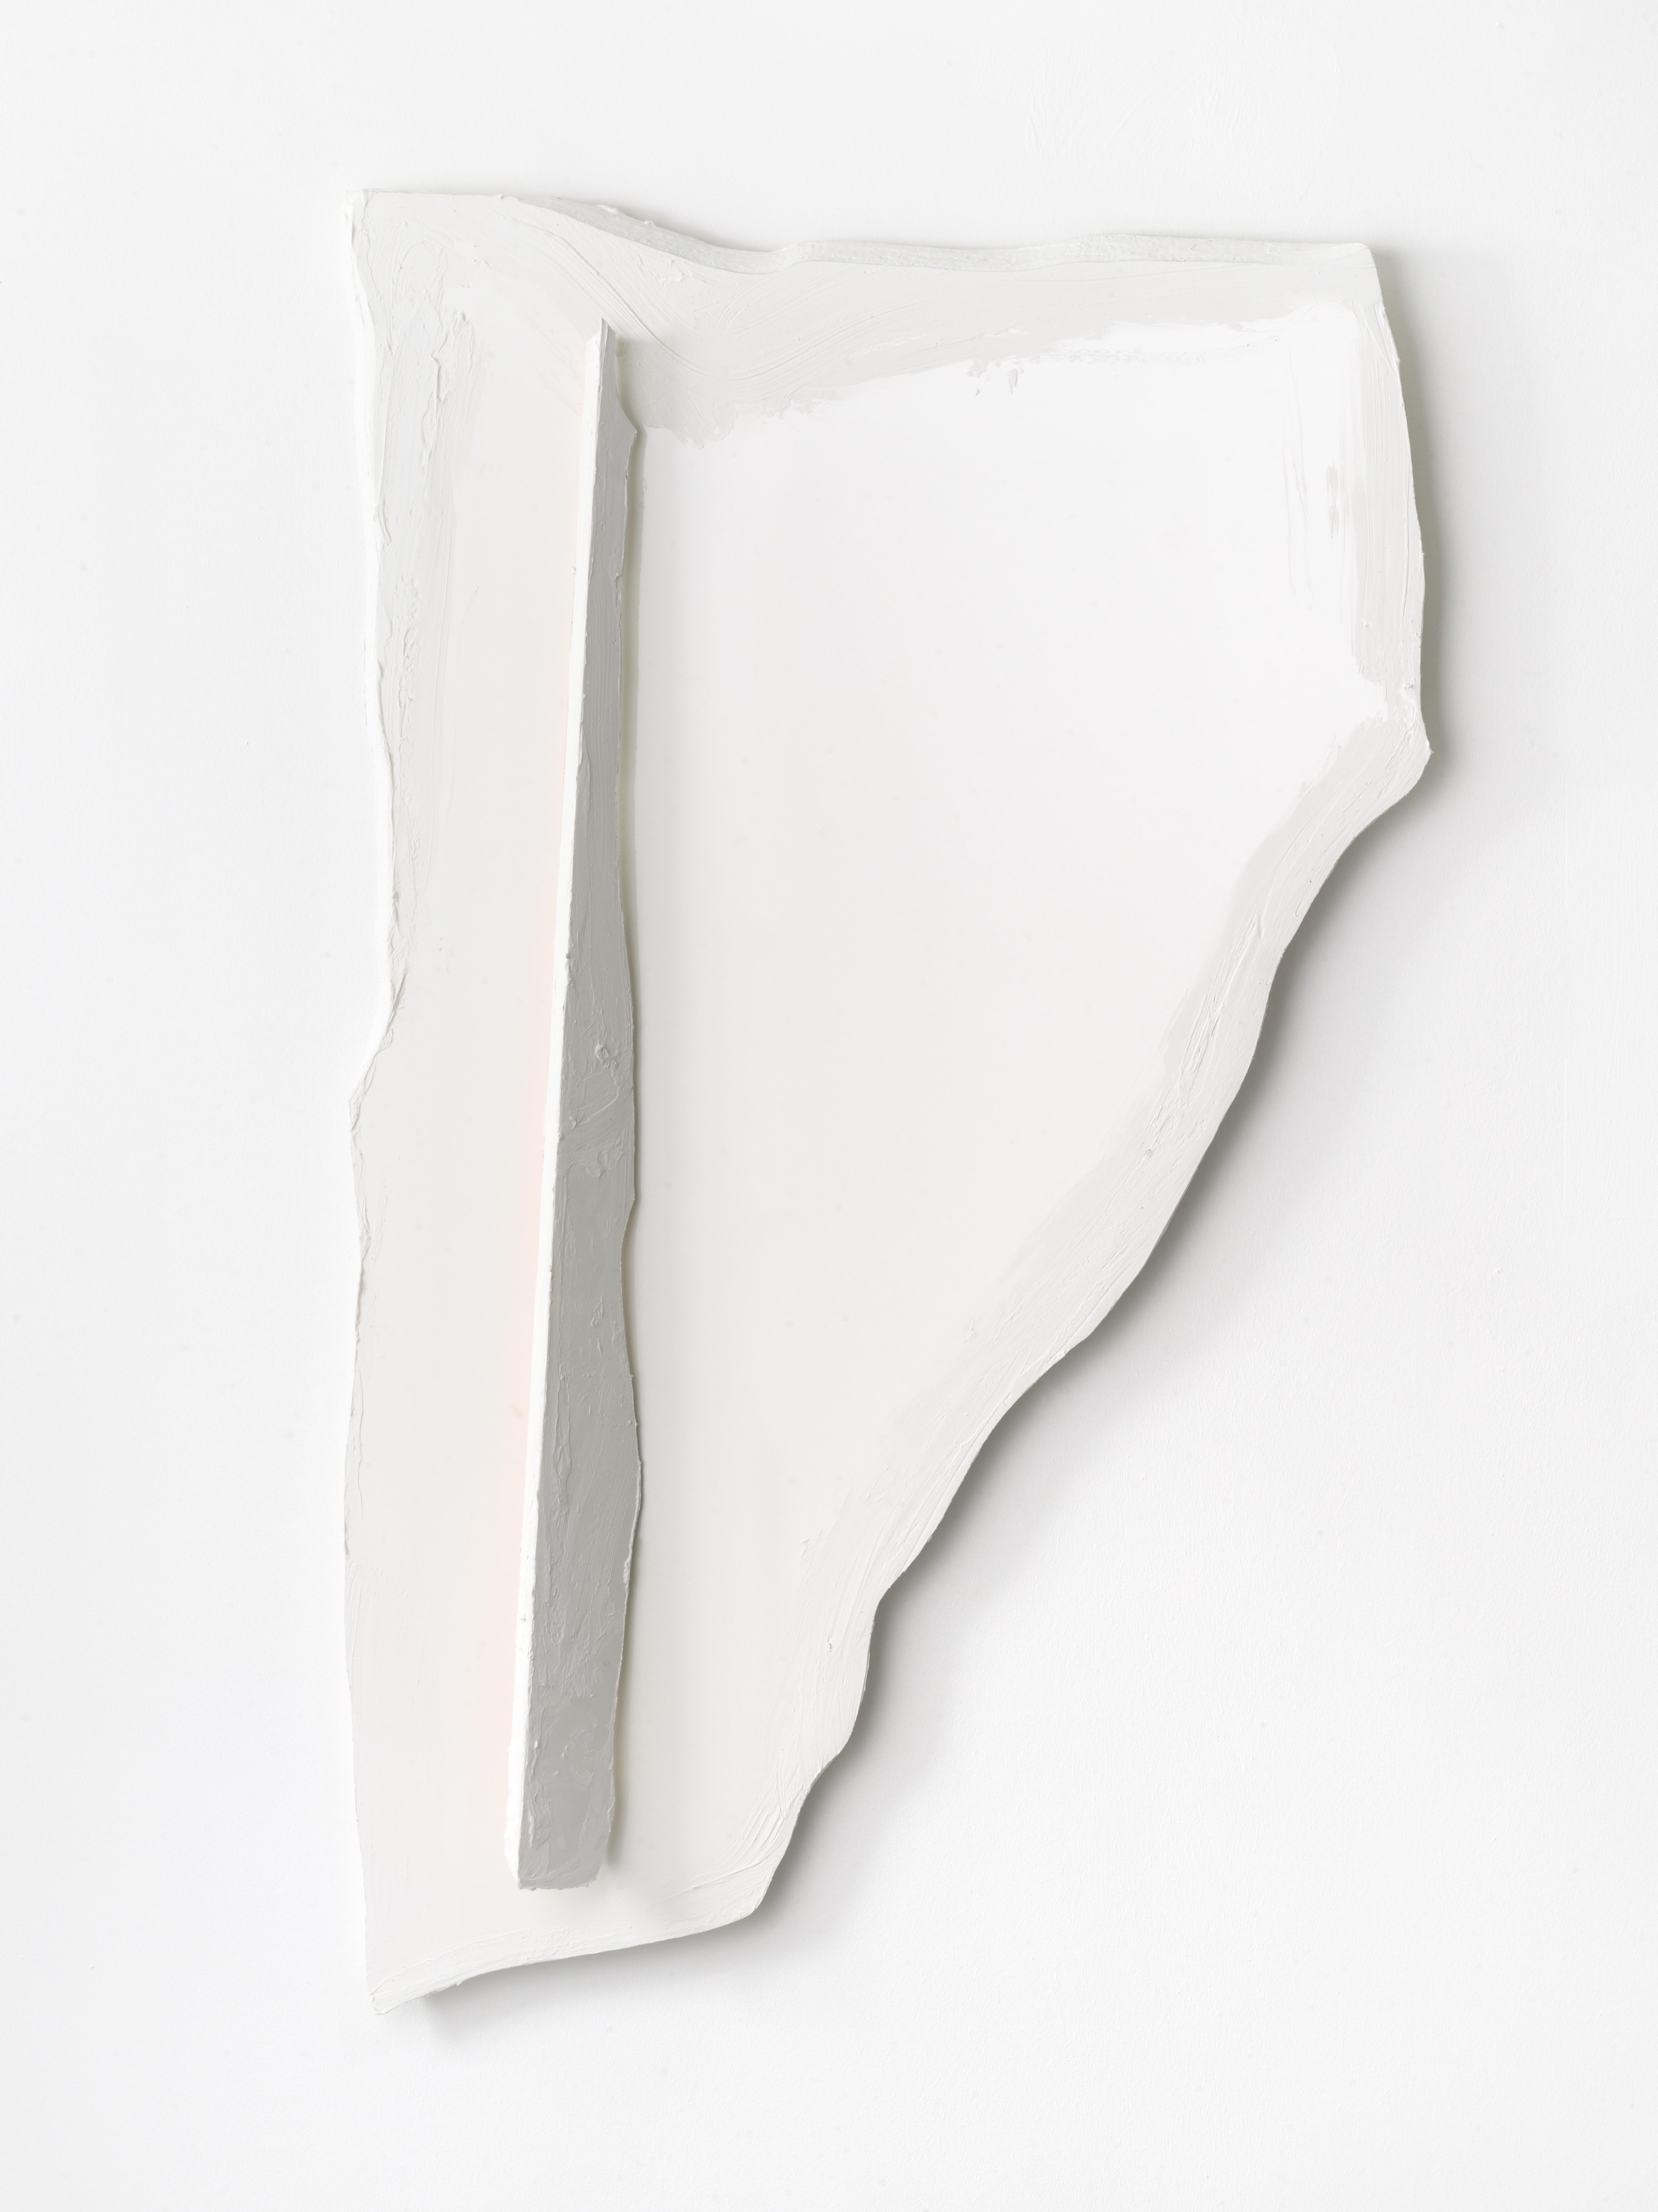 14. Adrian Altintas - AAD034 - 2021 - Untitled 150,4 x 89,6 x 5 cm. - Sandwichpanel, Acryl.